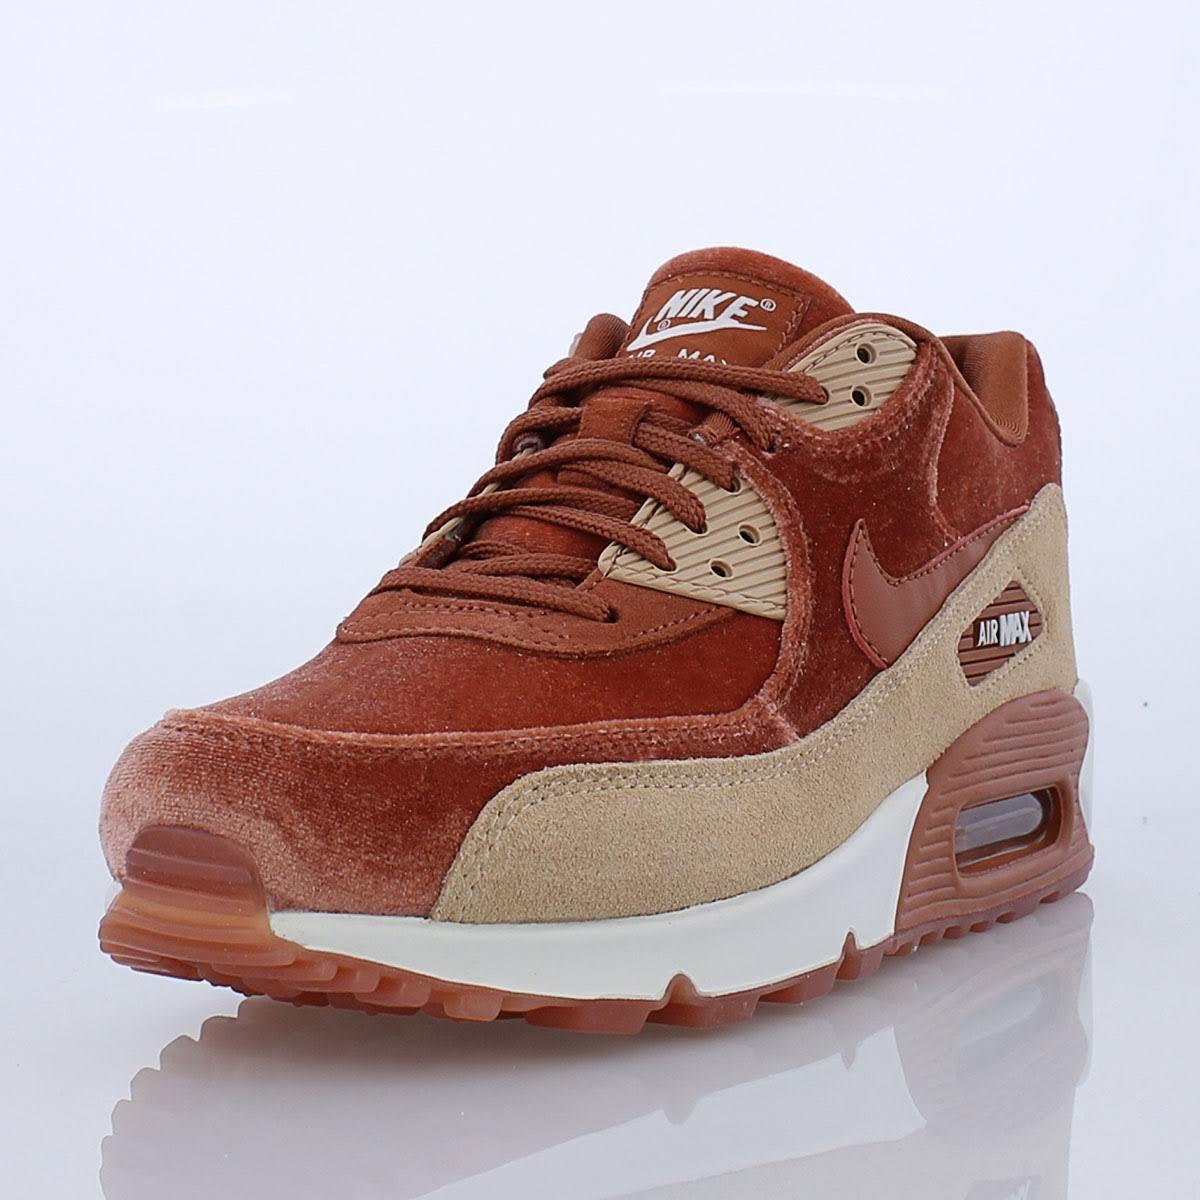 Lx Zapatos Beige Peach Max Nike 9 De Size Dusty Velvet Bio Mujer Air 90 XzOnBtq